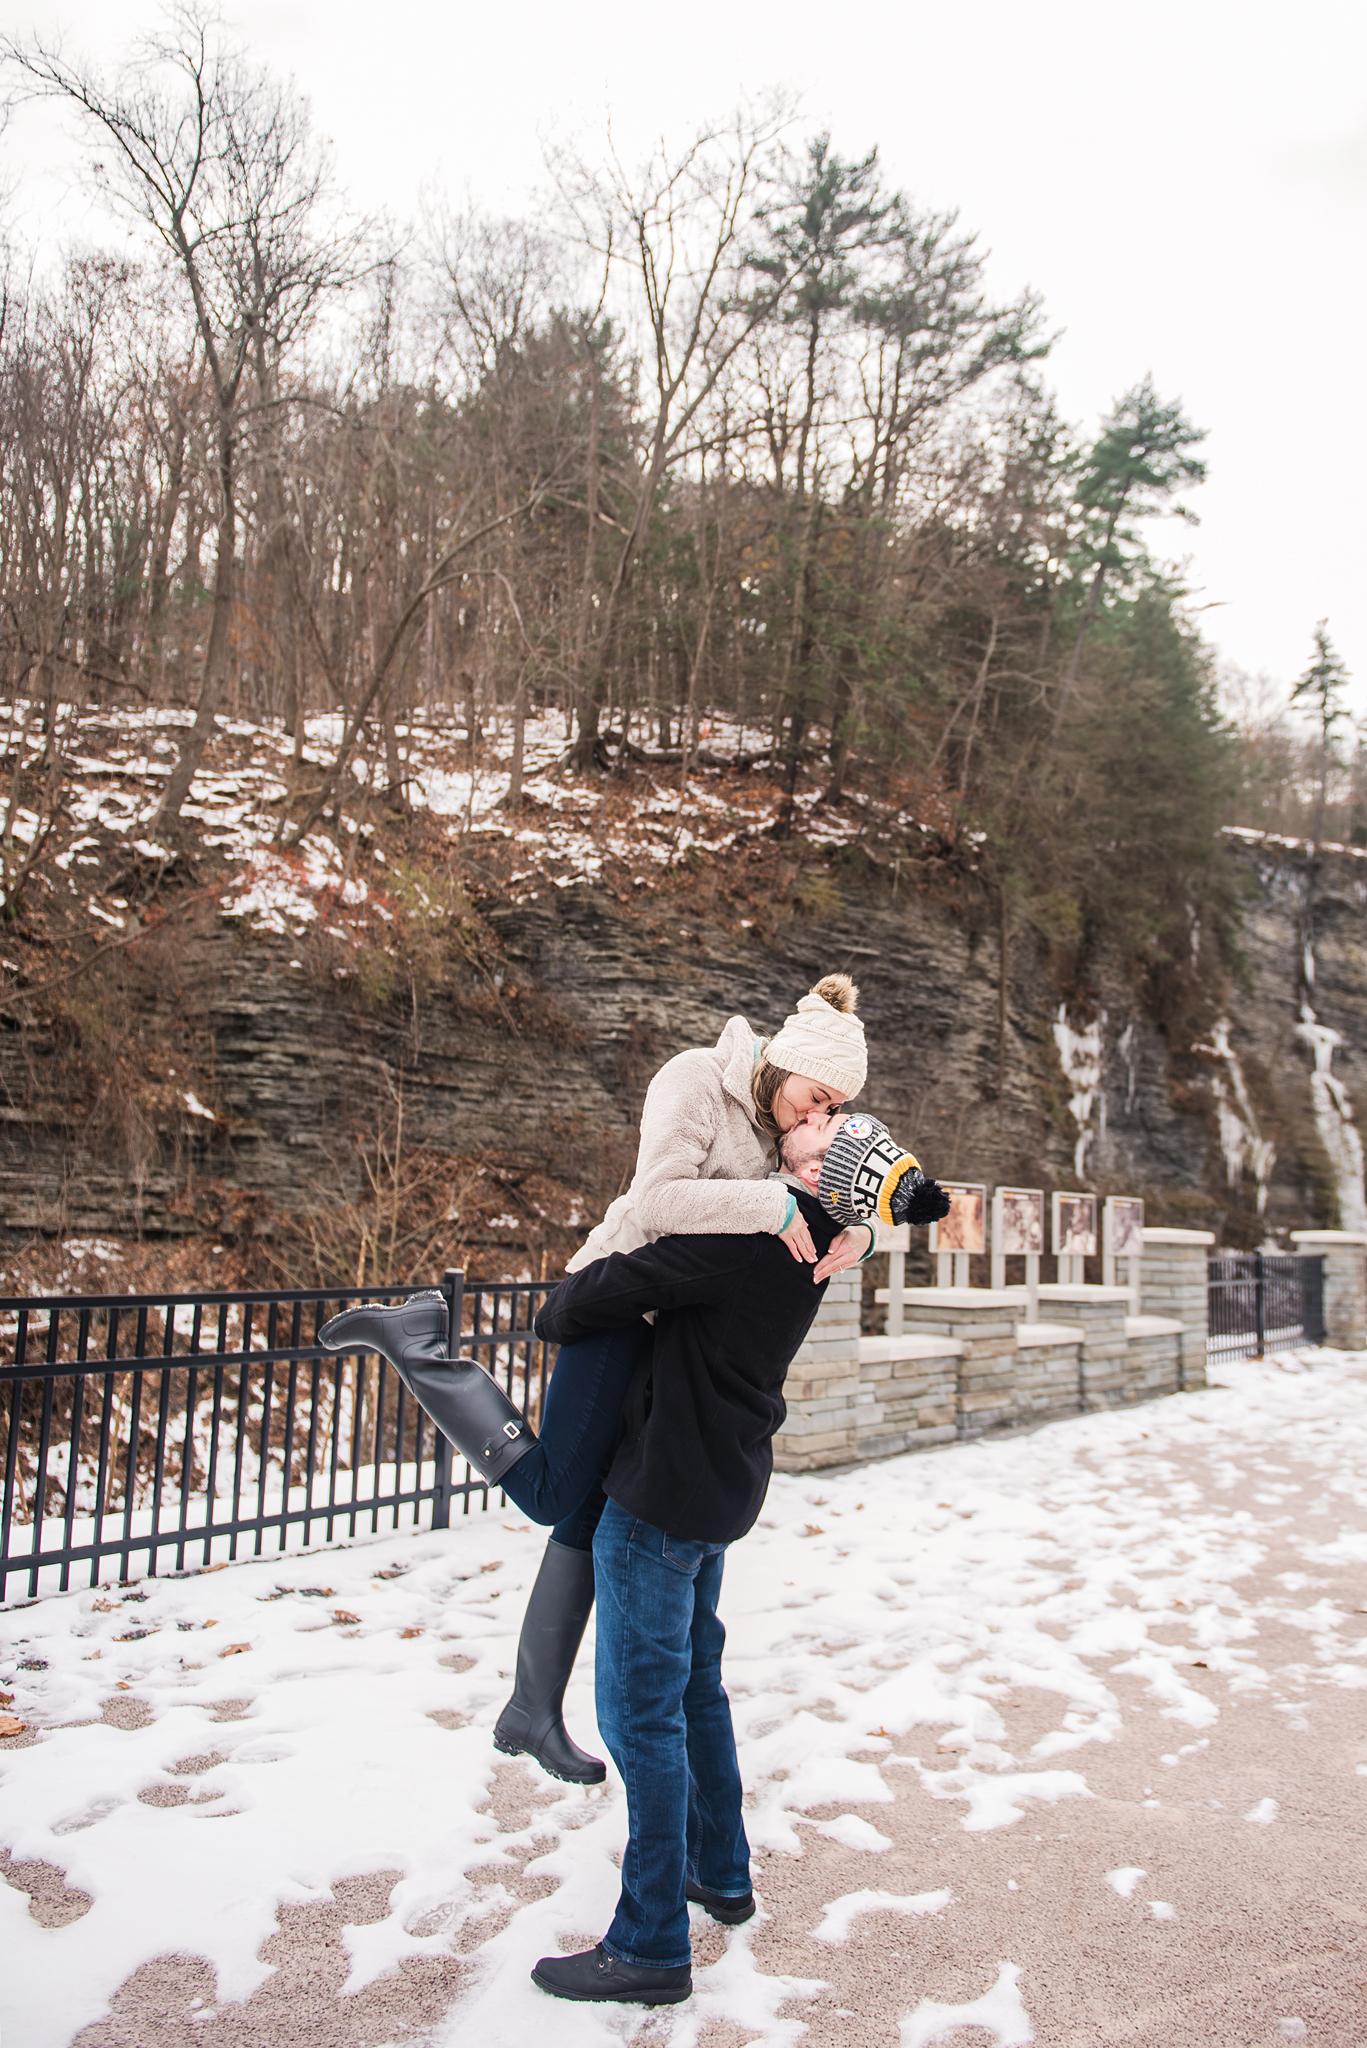 Watkins_Glen_State_Park_Shequaga_Falls_Finger_Lakes_Proposal_JILL_STUDIO_Rochester_NY_Photographer_DSC_1393.jpg